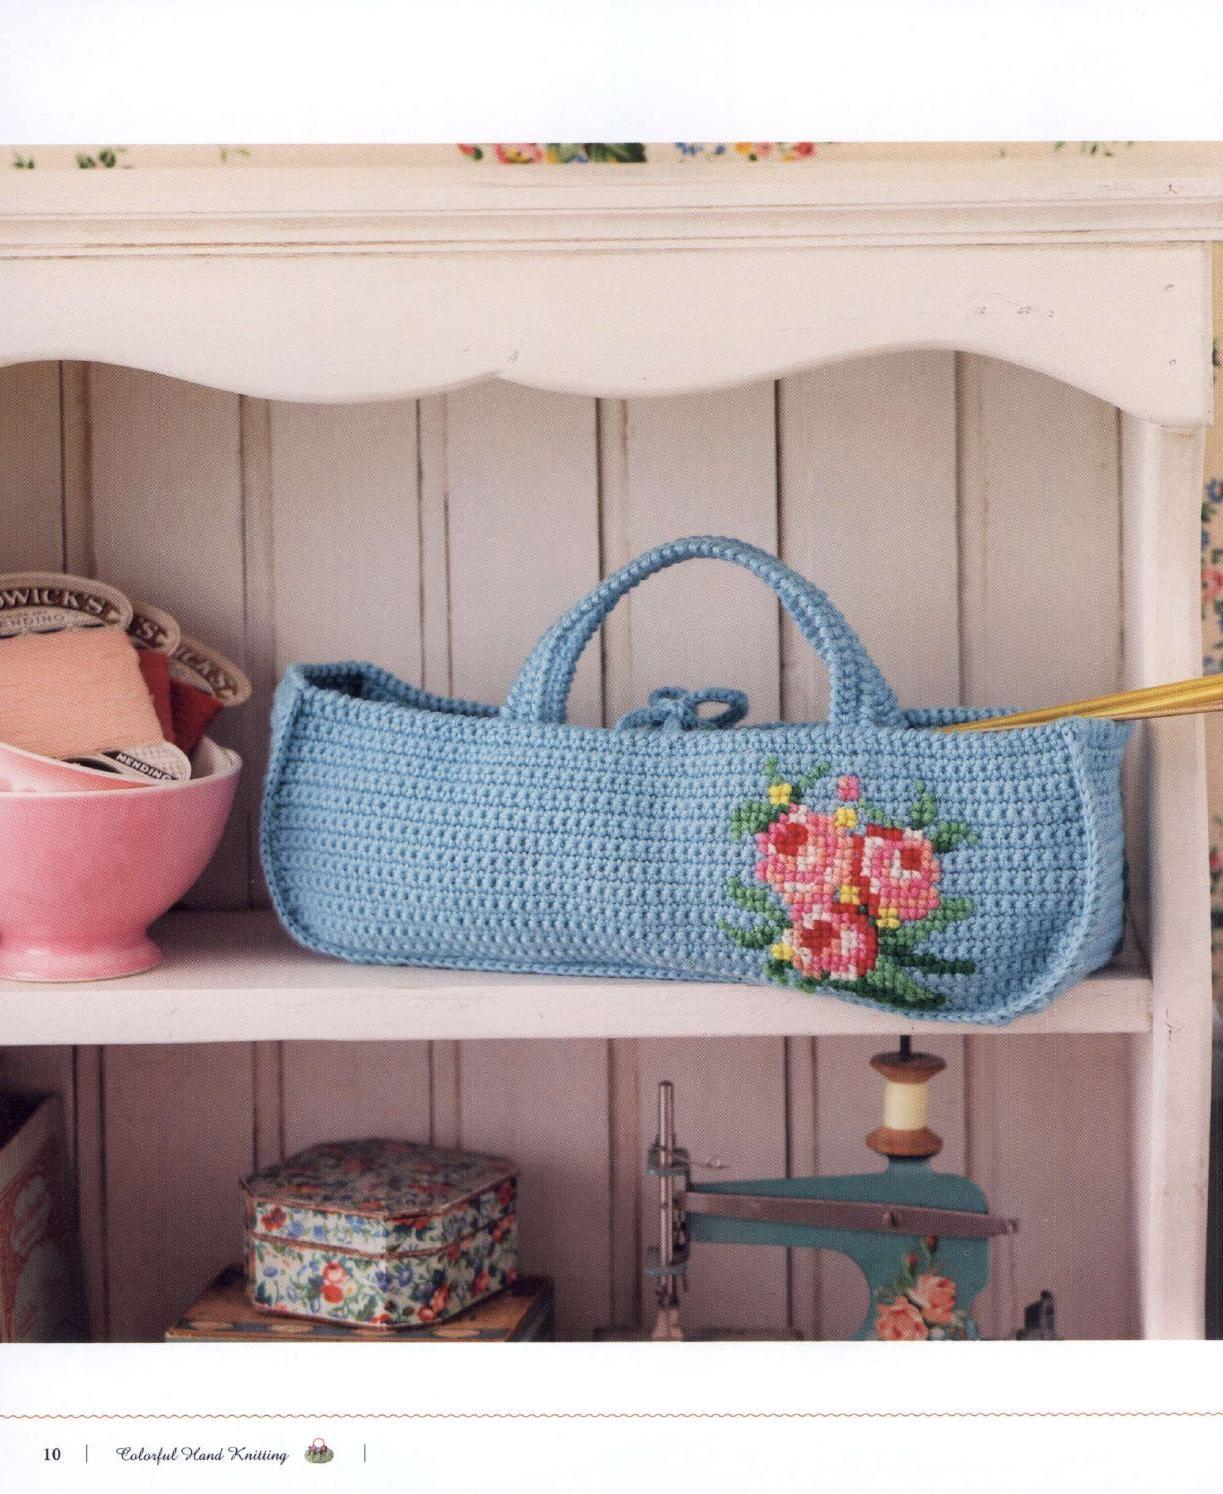 ISSUU - Crochet pretty color by vlinderieke